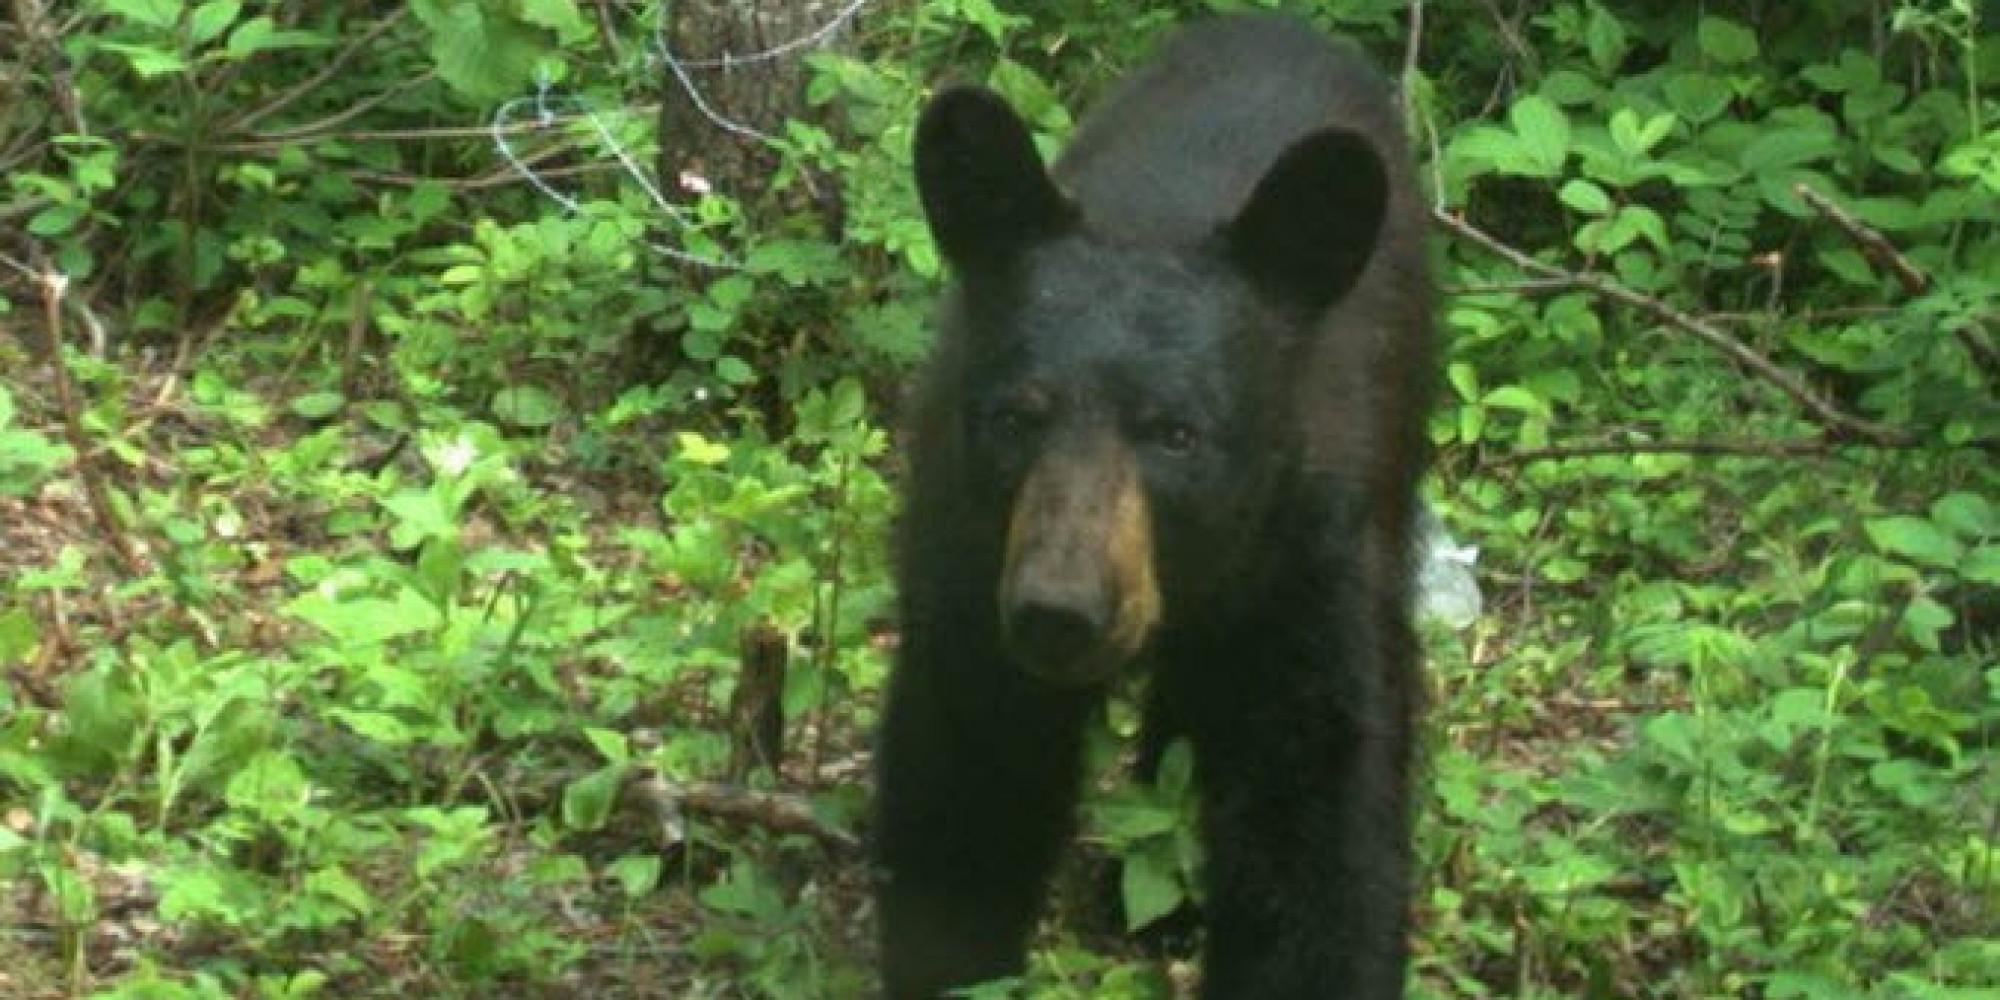 elk island national park cameras capture elusive black